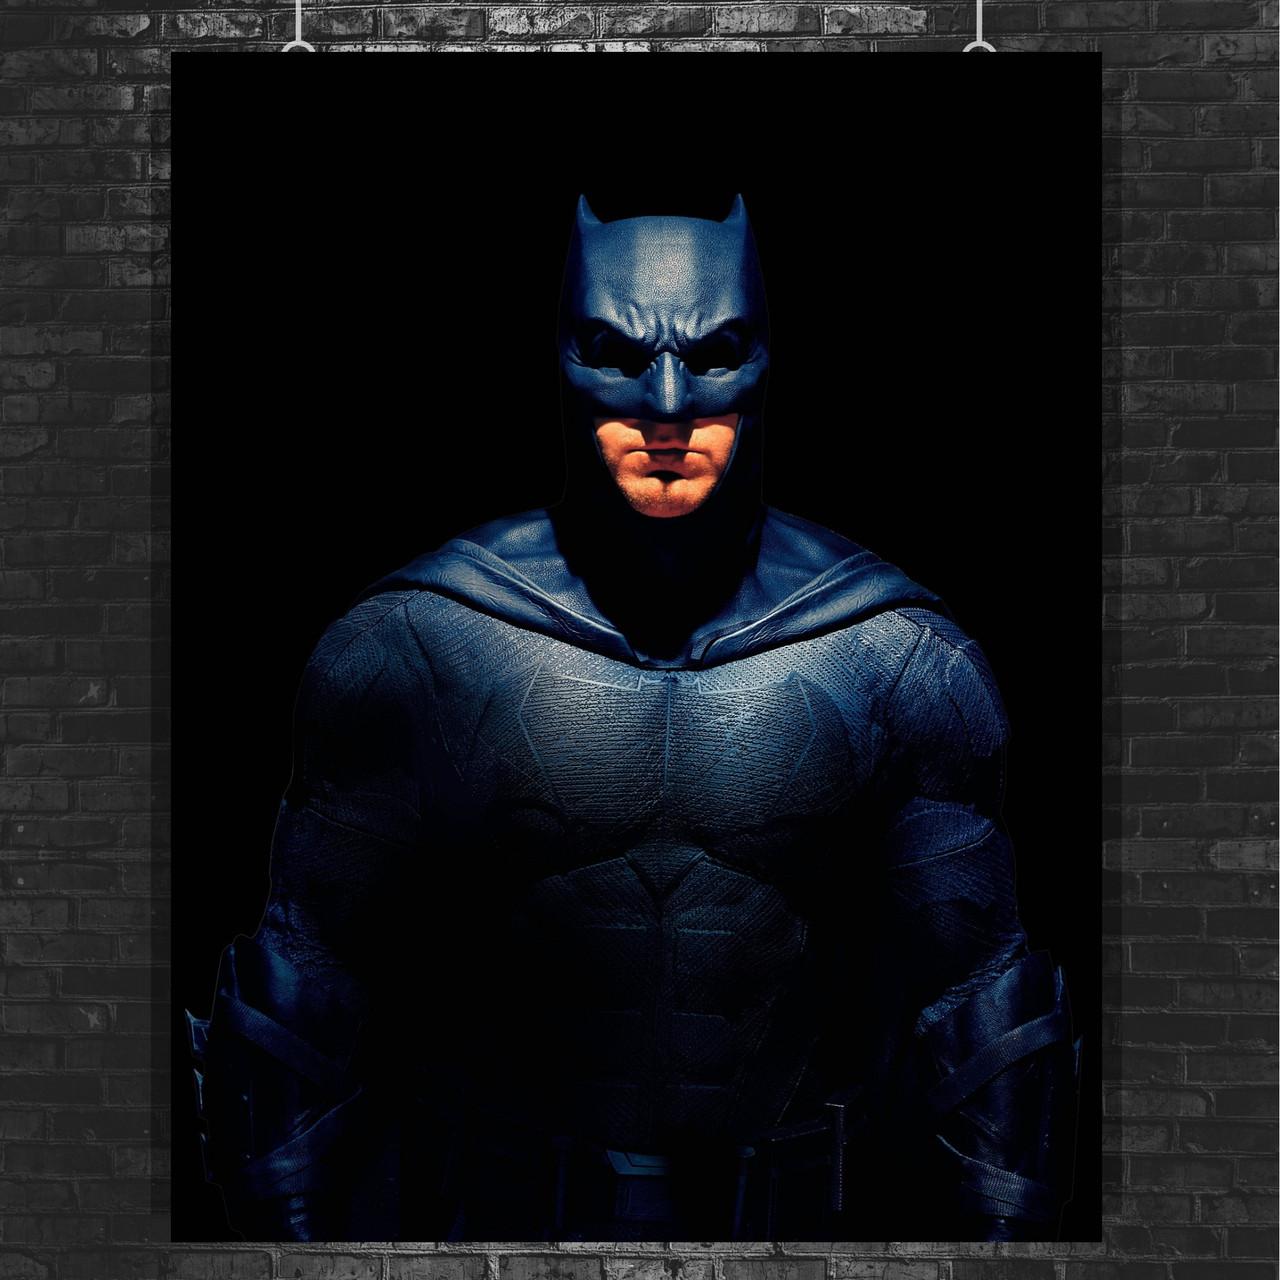 Постер Бэтмен, Batman. Лига Справедливости, Justice League. Размер 60x47см (A2). Глянцевая бумага